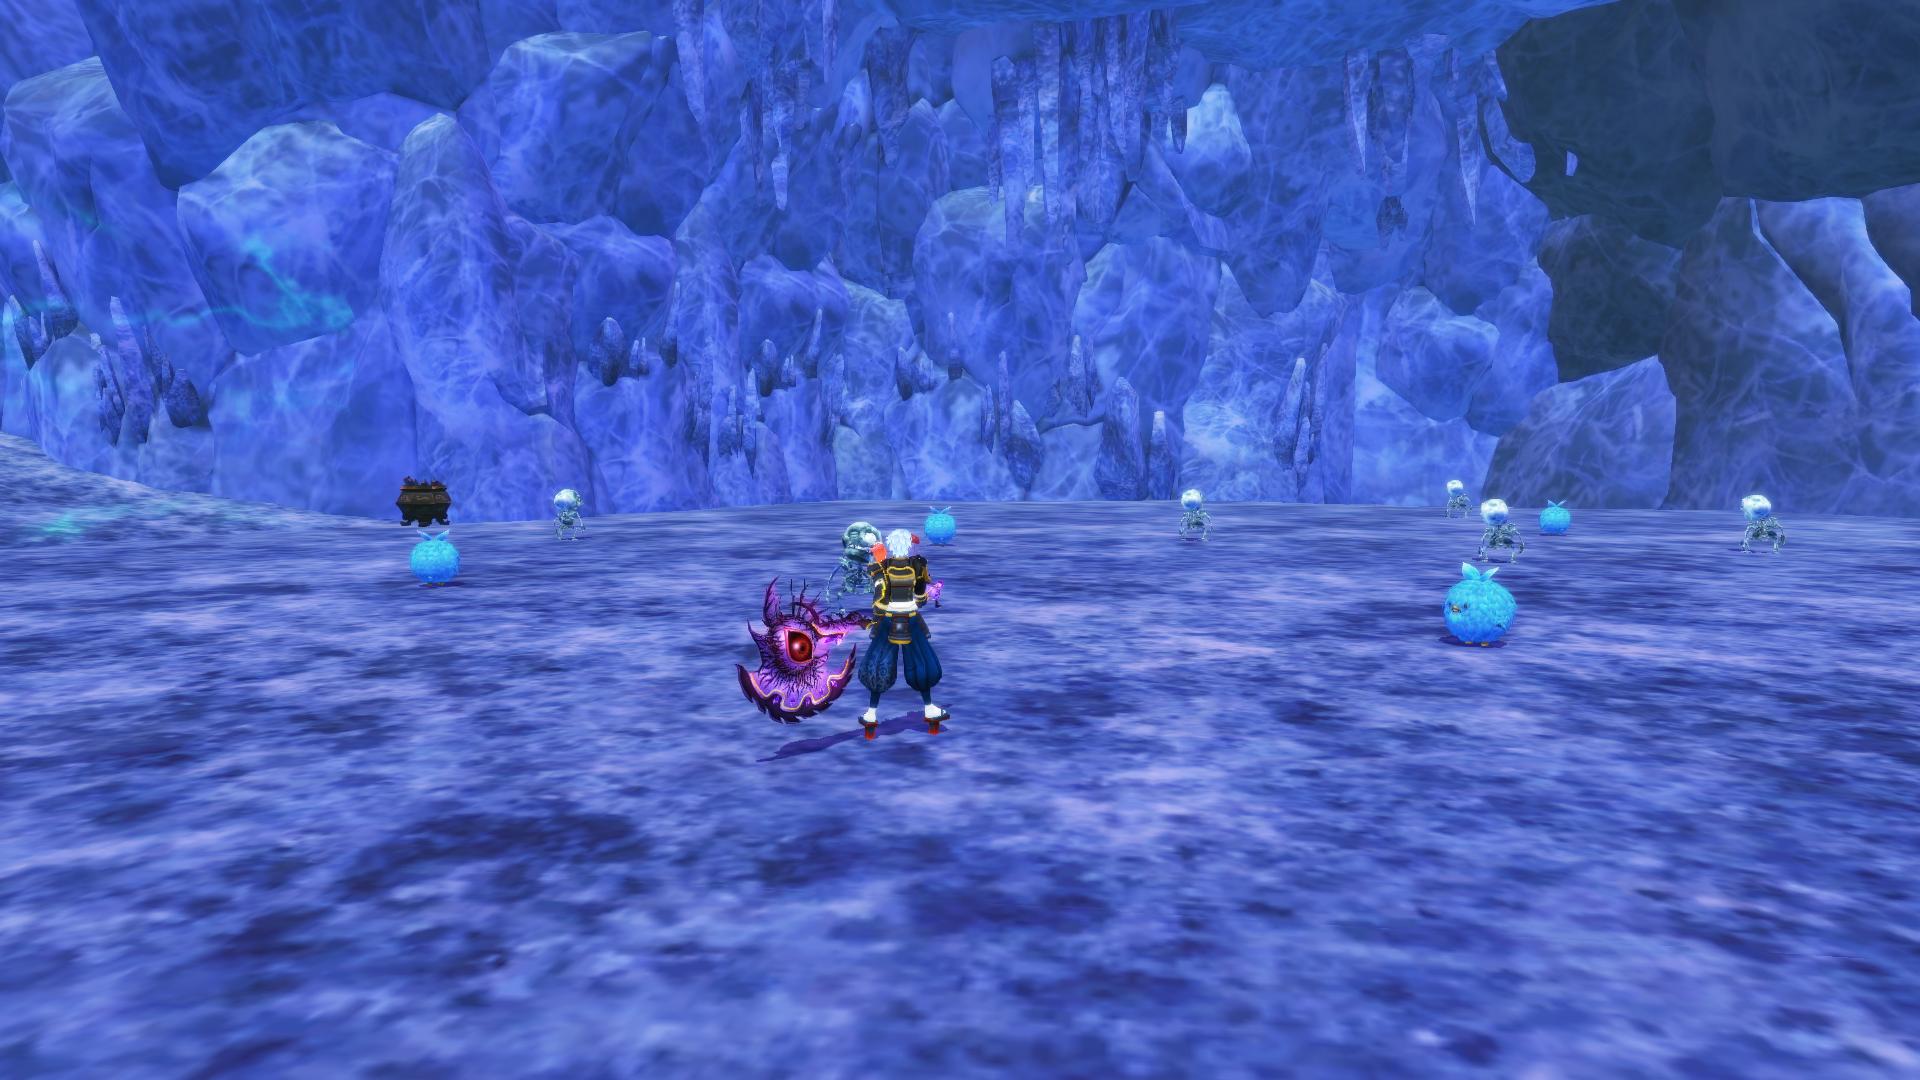 Ice Caverns (Shocking Mist)